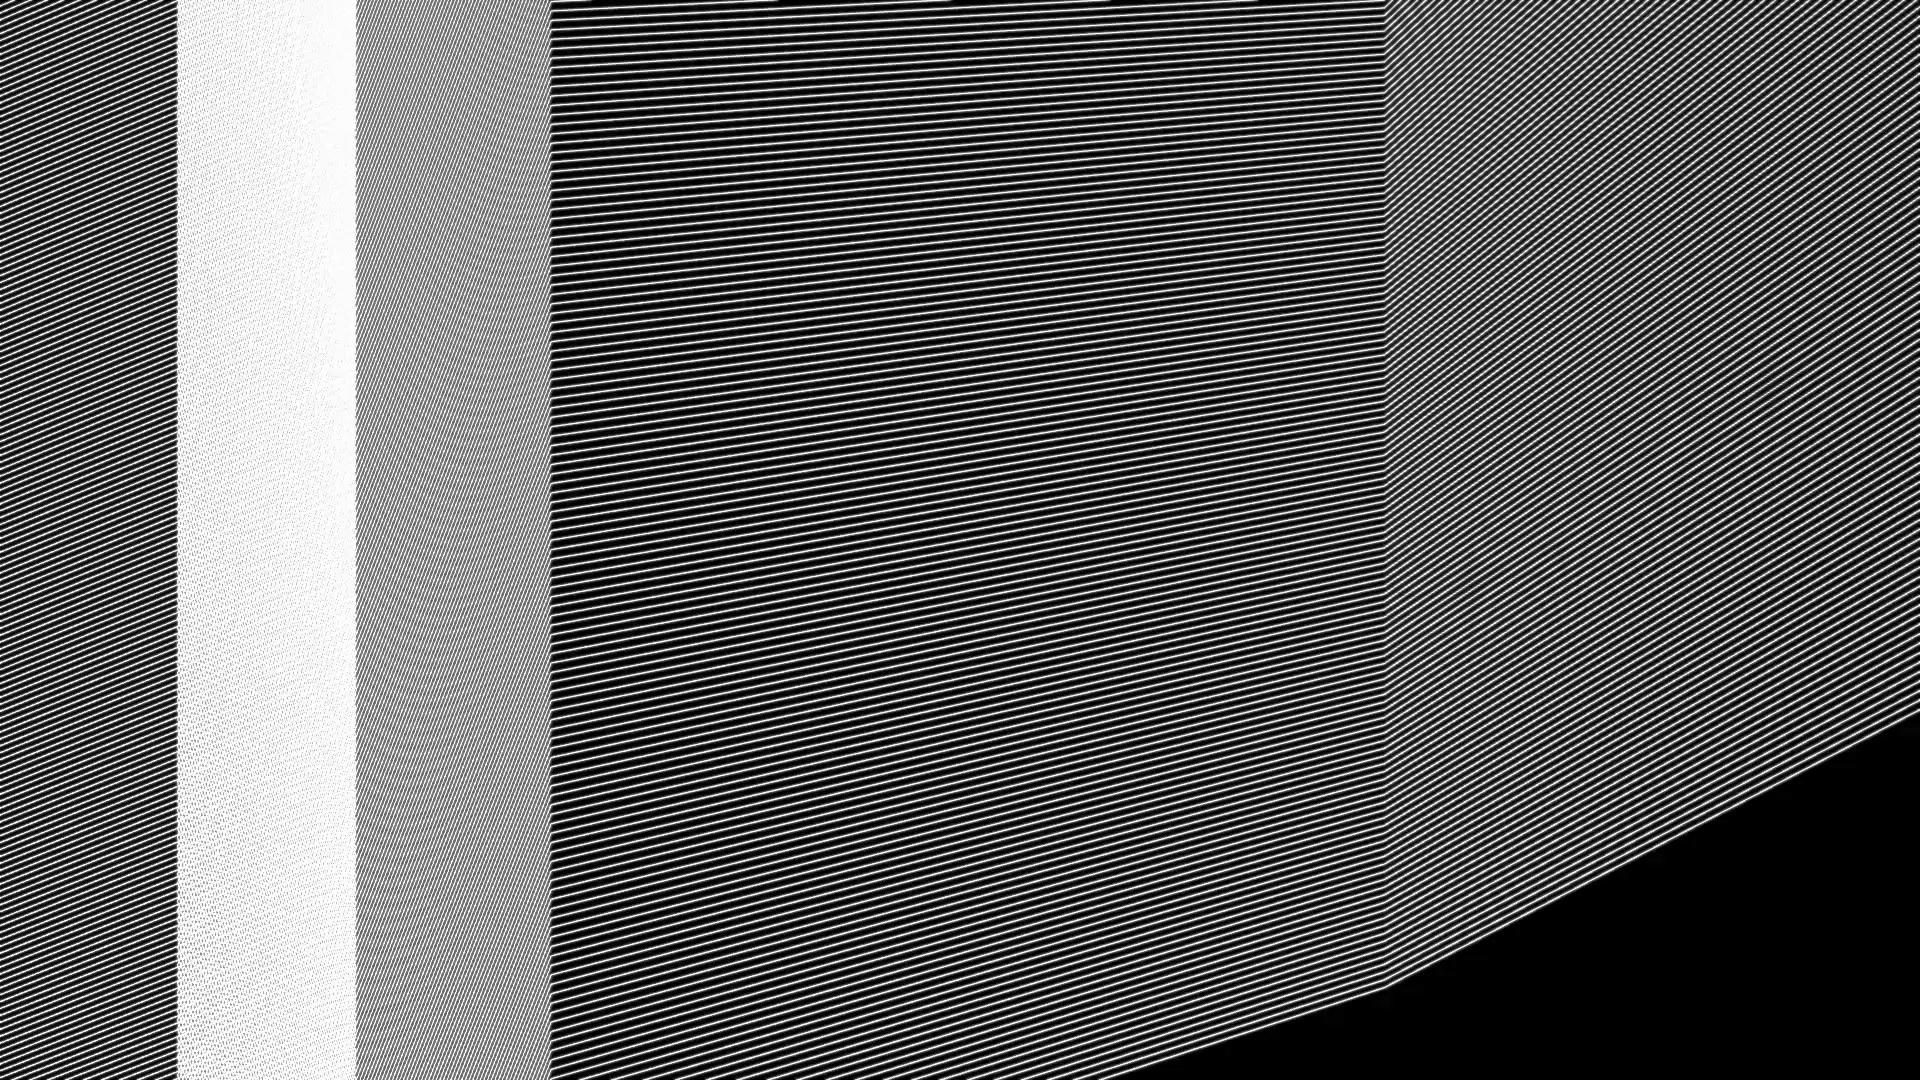 TONOPTIK (Yuriy Tolstoguzov, Alex Inkov) (Russia), ZEN, 2019 (1)